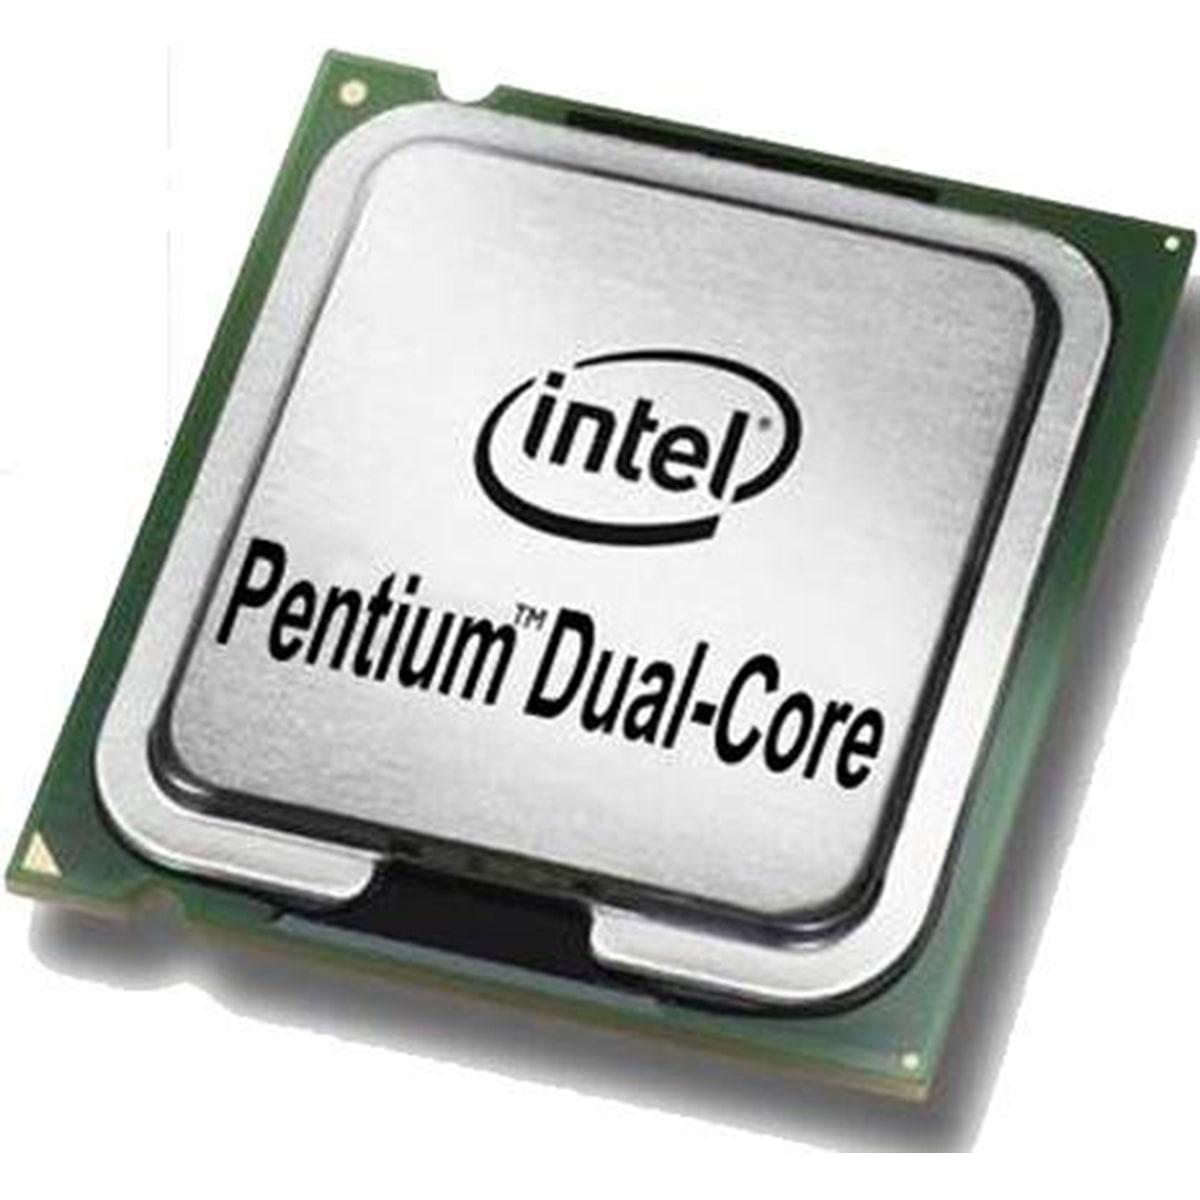 Processador Intel Dual Core E2140 1,60Ghz 1M Cache 800 MHz Socket 775 - Seminovo